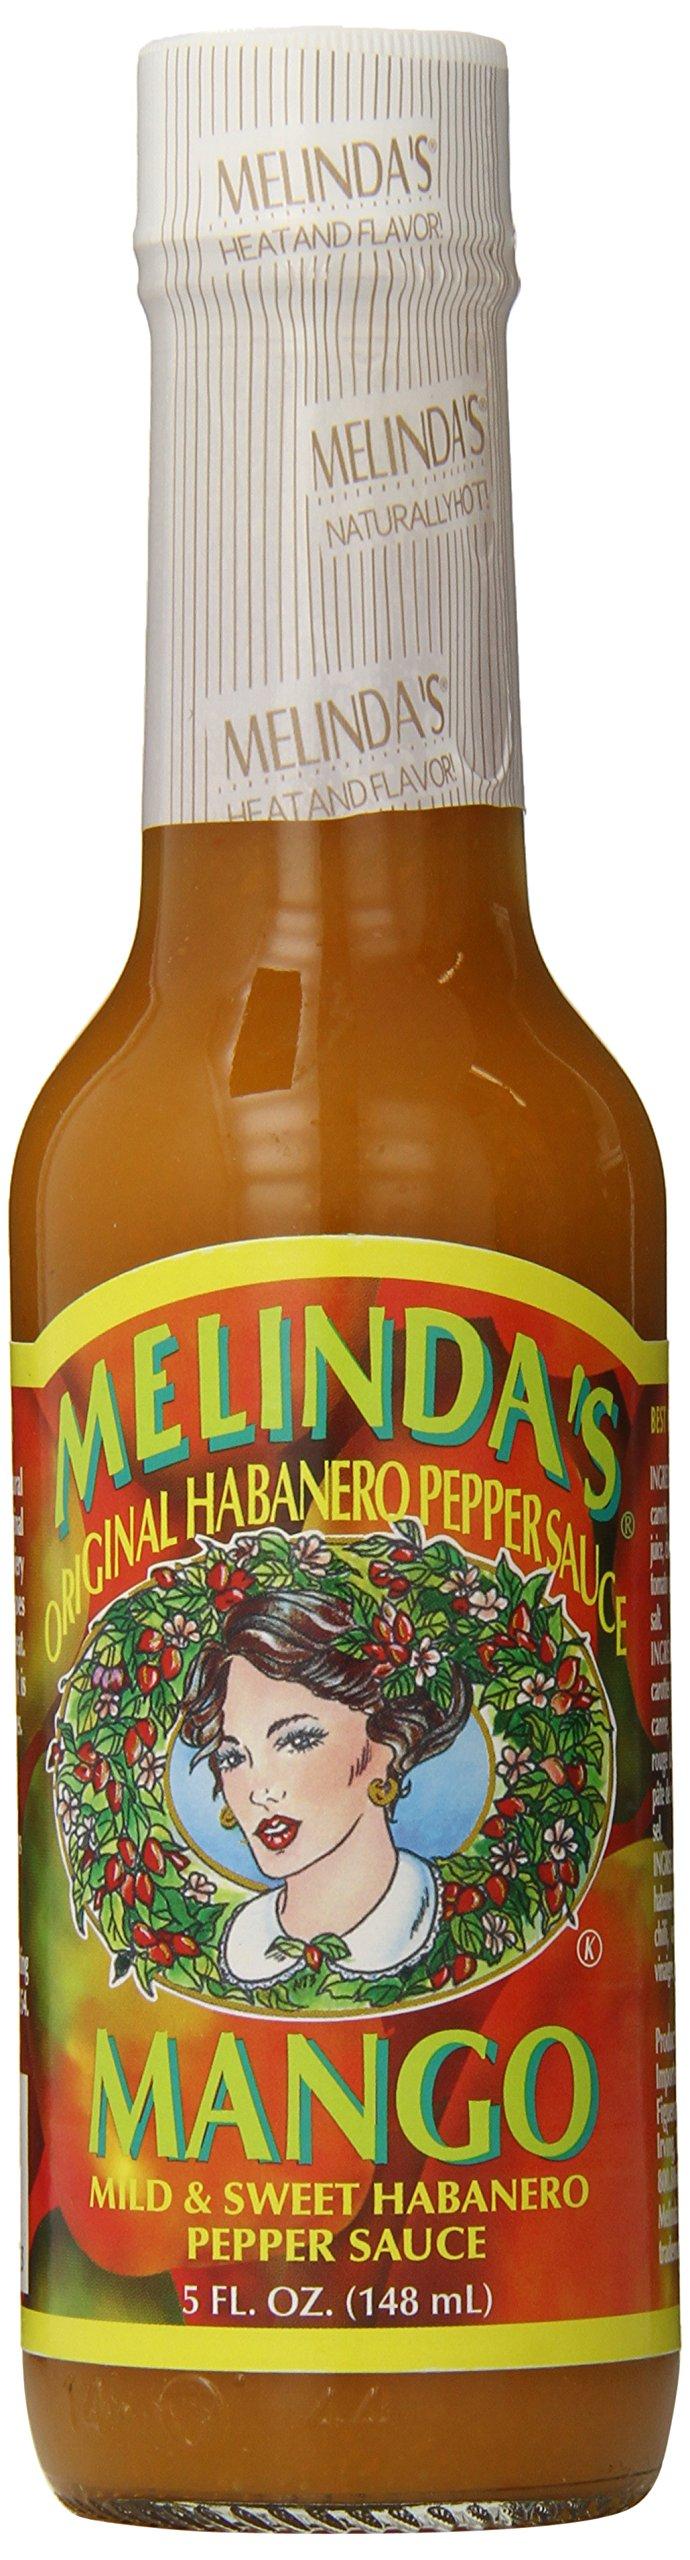 Melinda's Mango Habanero Hot Pepper Sauce